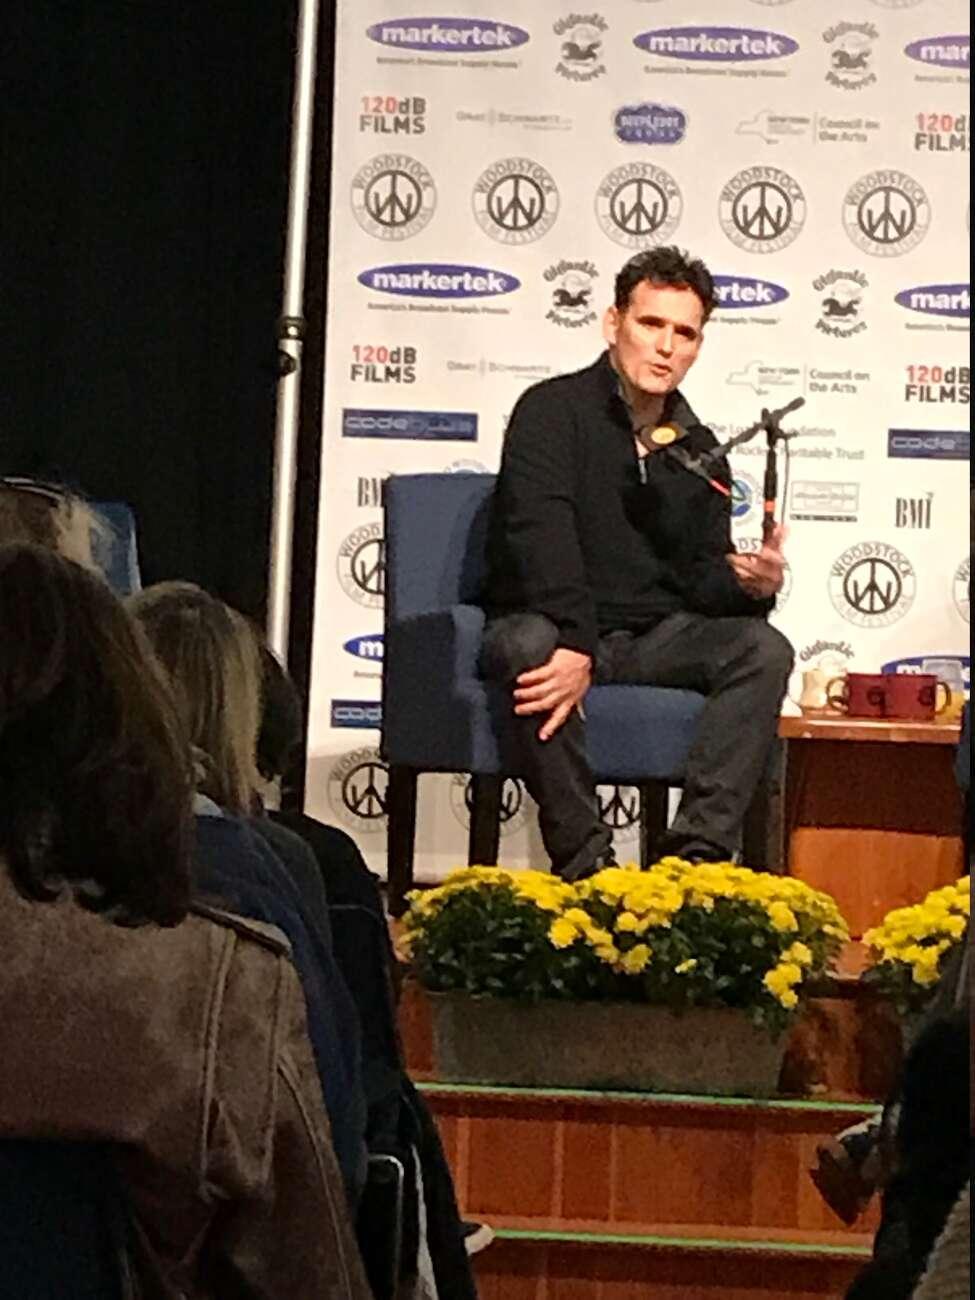 Matt Dillon talks about his film career at the Woodstock Film Festival on Oct. 5.